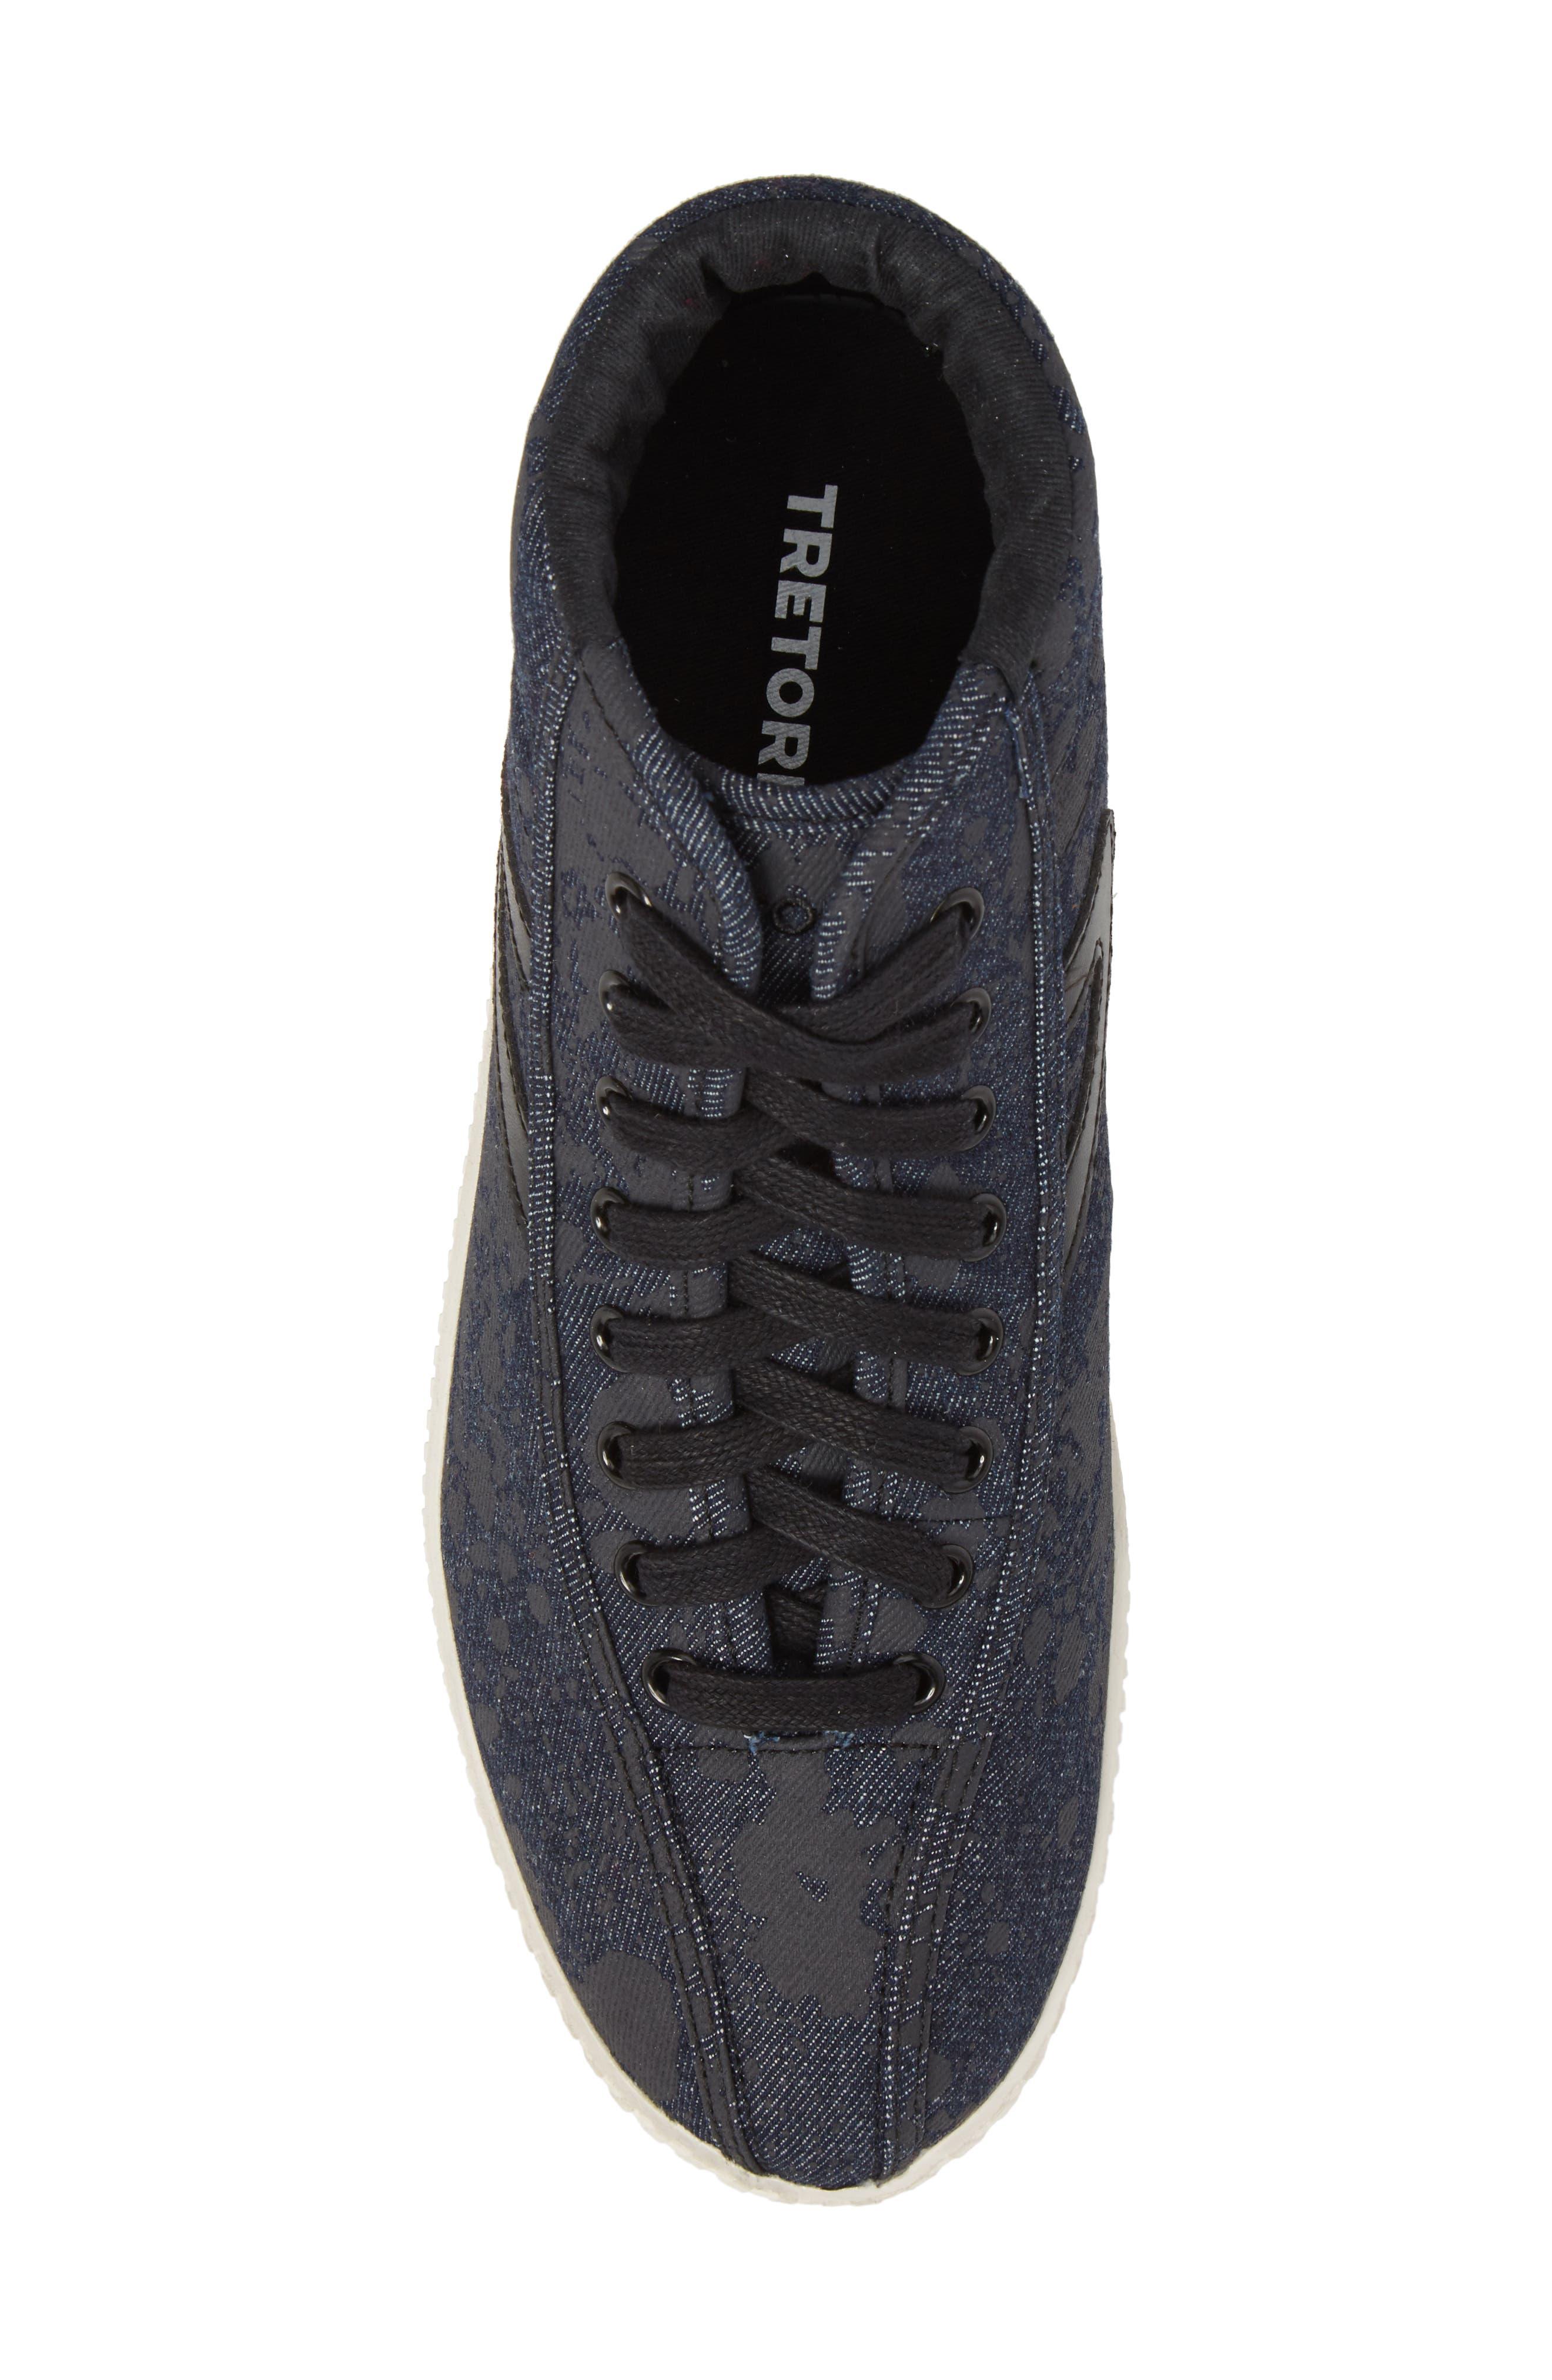 Nylite High Top Sneaker,                             Alternate thumbnail 5, color,                             Nero Opaco/ Black Denim